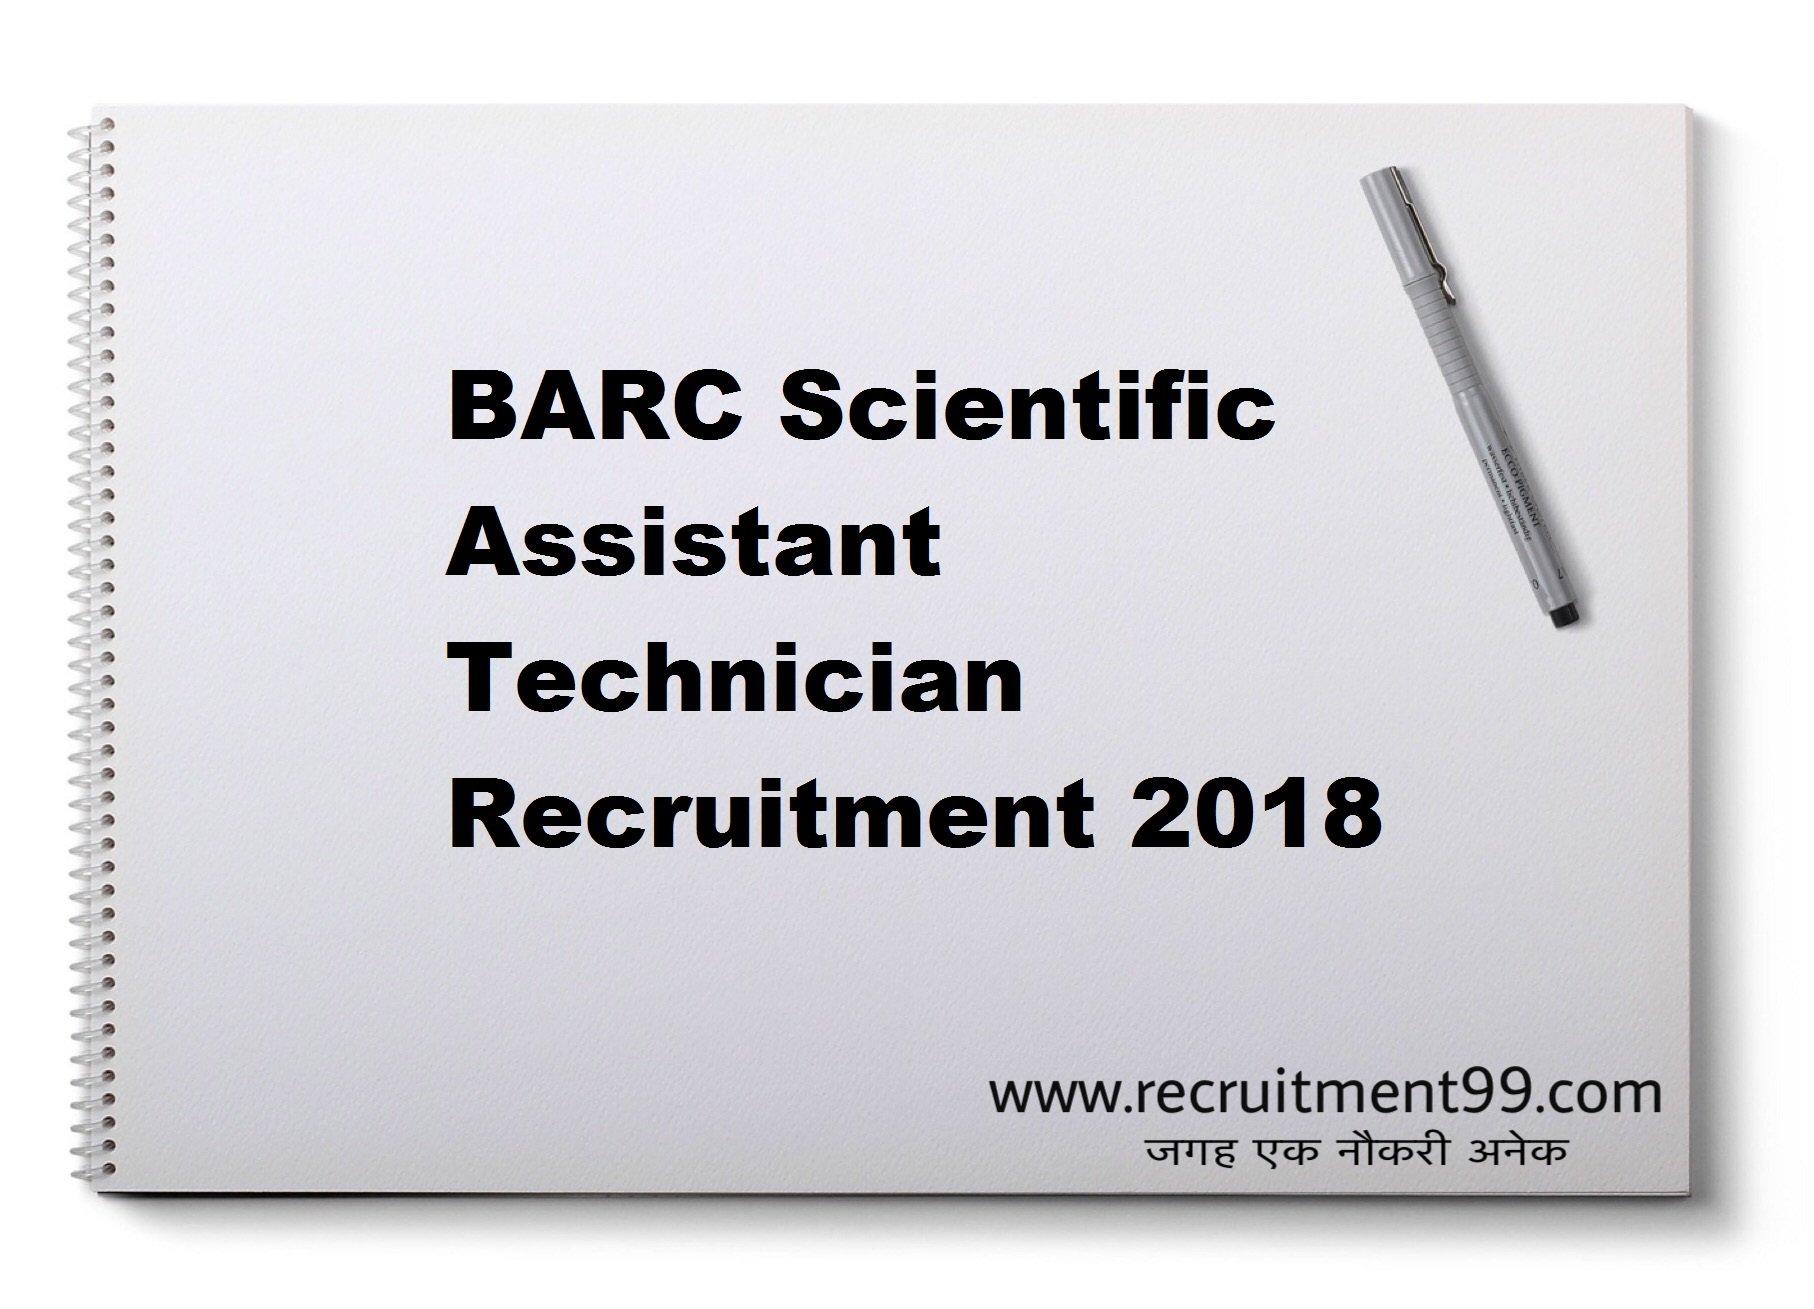 BARC Scientific Assistant Technician Recruitment Admit Card Result 2018